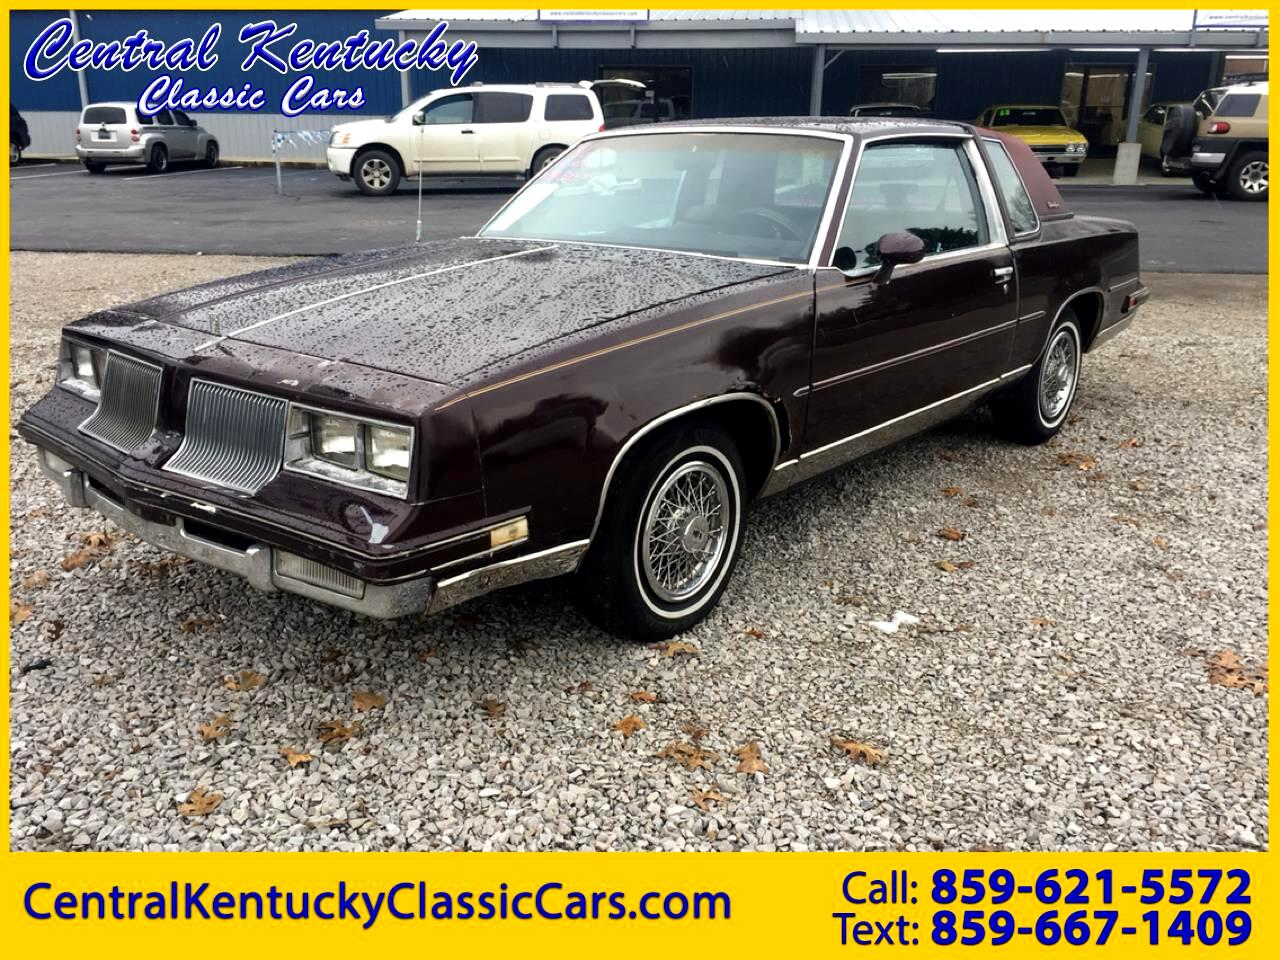 1986 Oldsmobile Cutlass Supreme Coupe